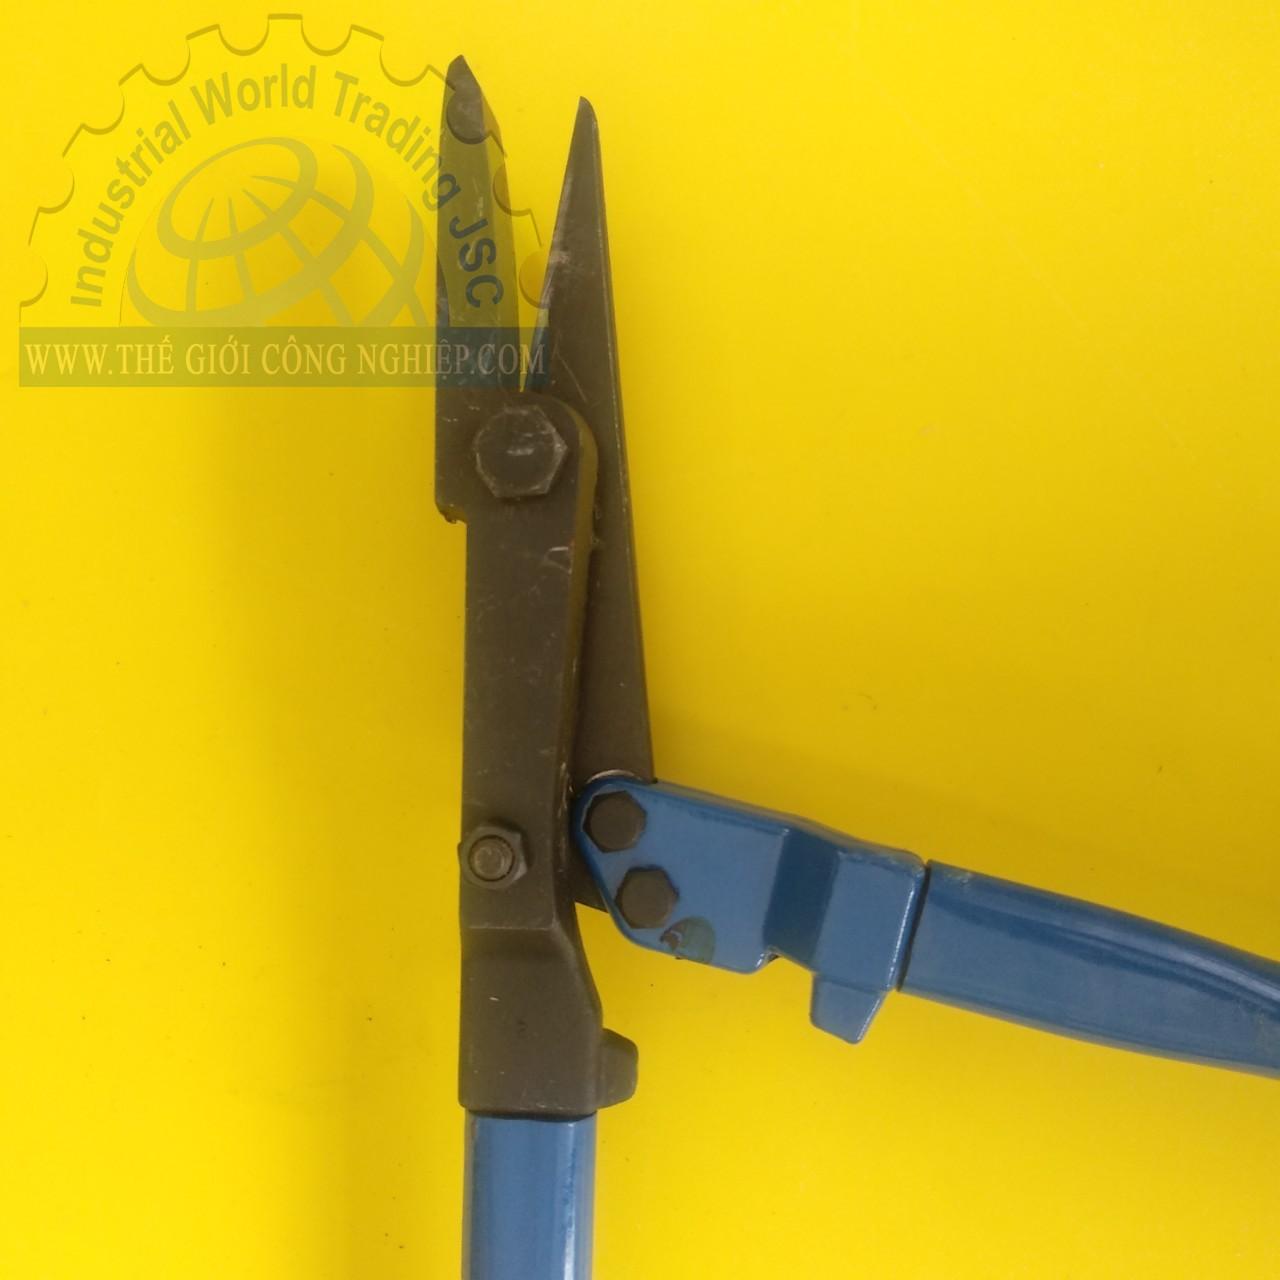 Kéo cắt dây đai thép  H306 Ybico